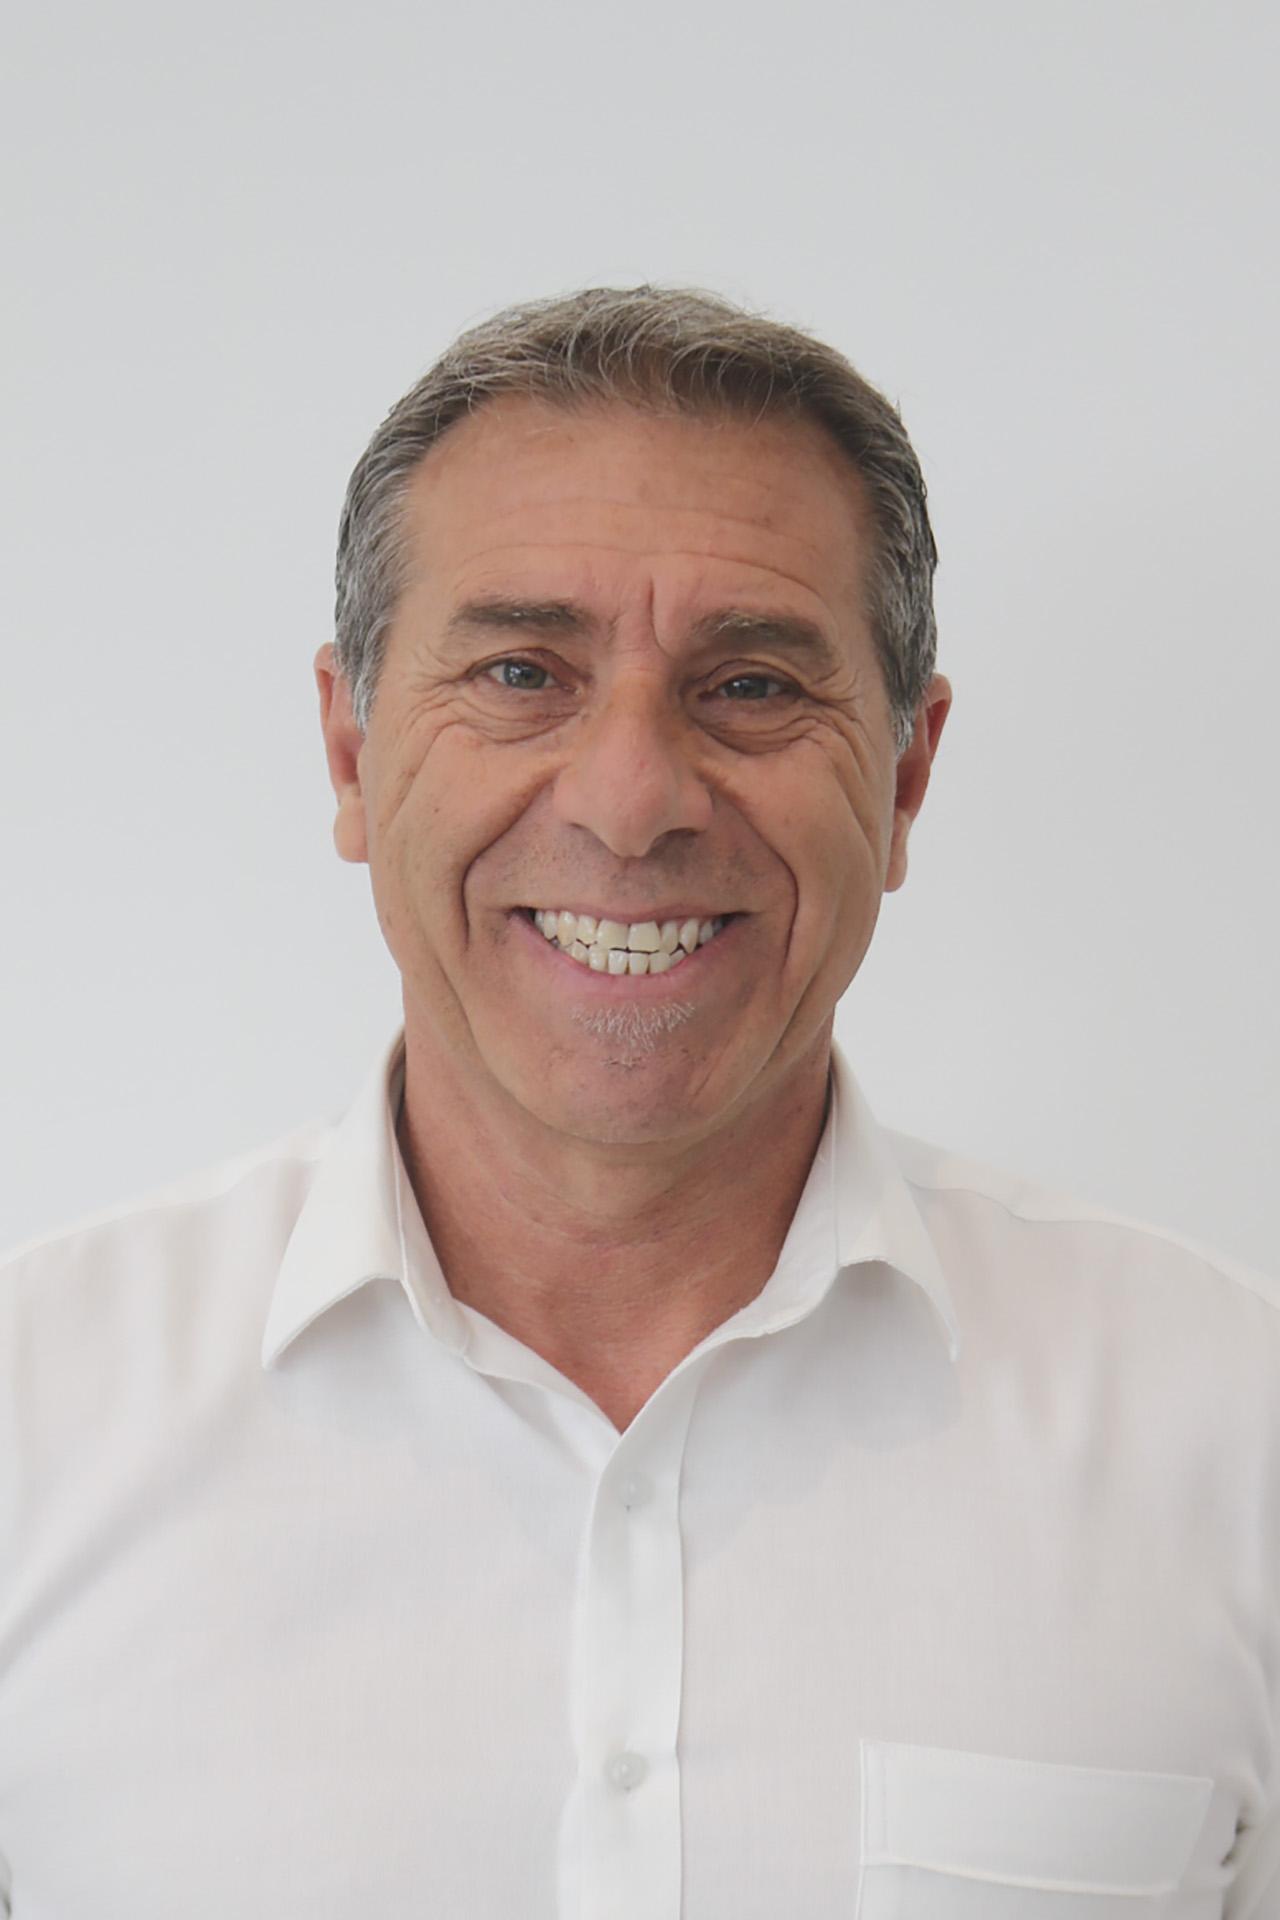 GEORGE MESSIH